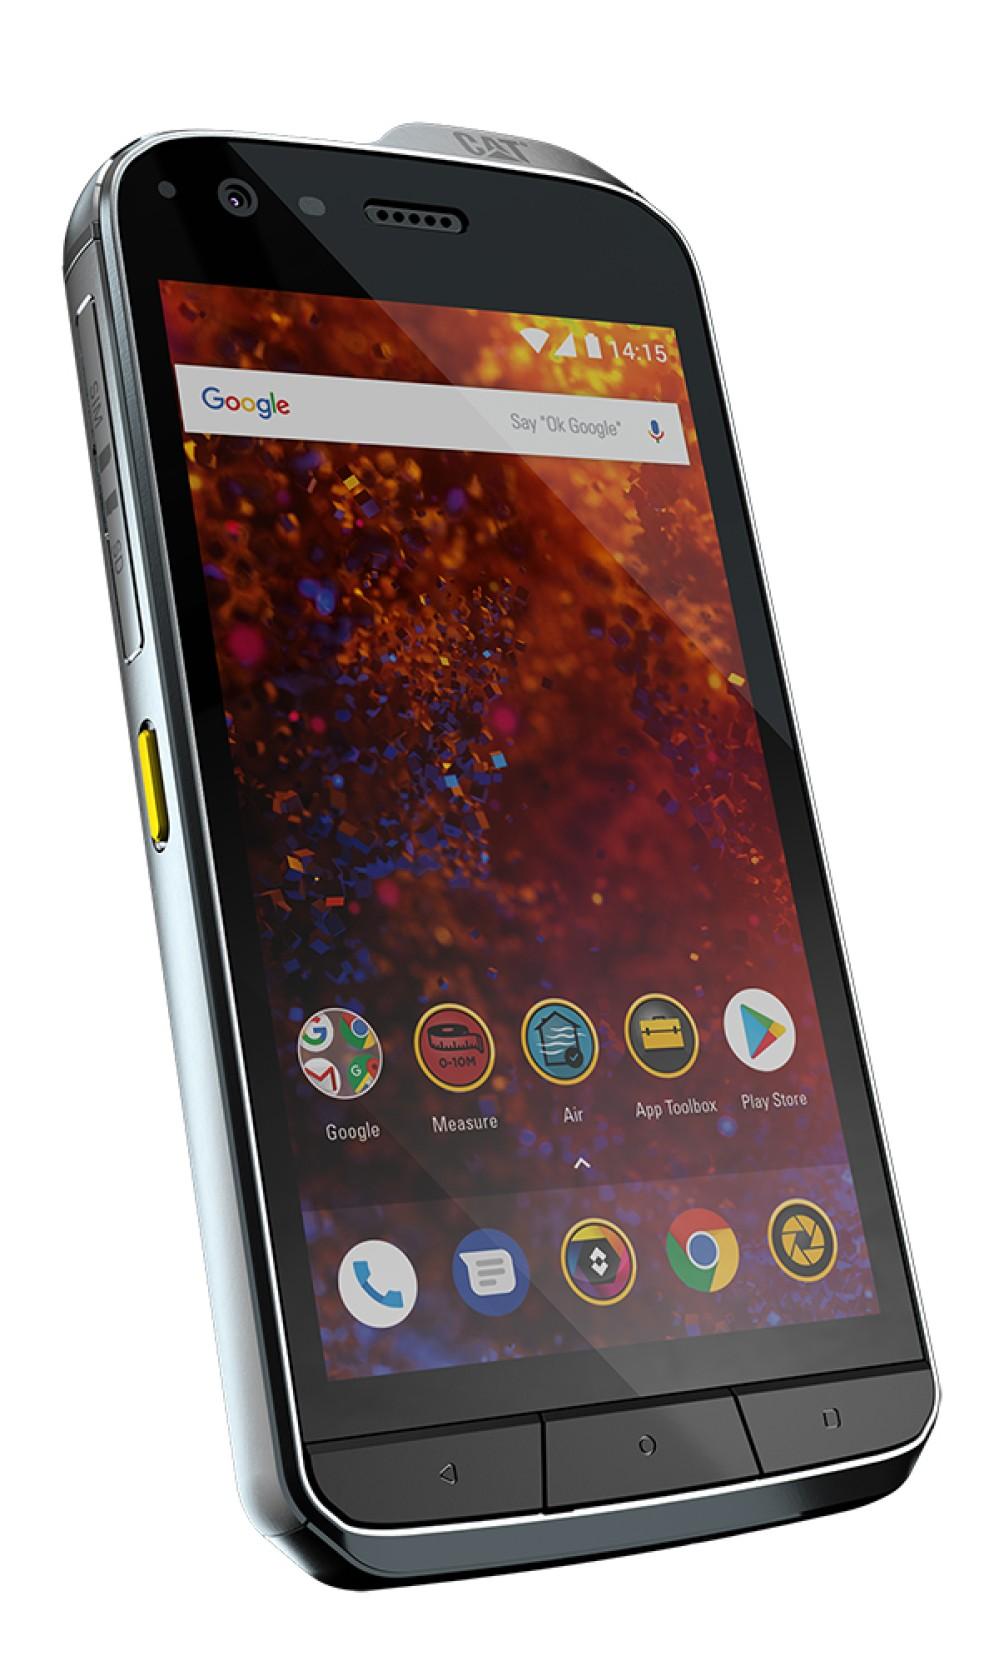 CAT S61: Επίσημα το νέο θωρακισμένο smartphone με θερμική κάμερα και Android 8.0 Oreo [Video]